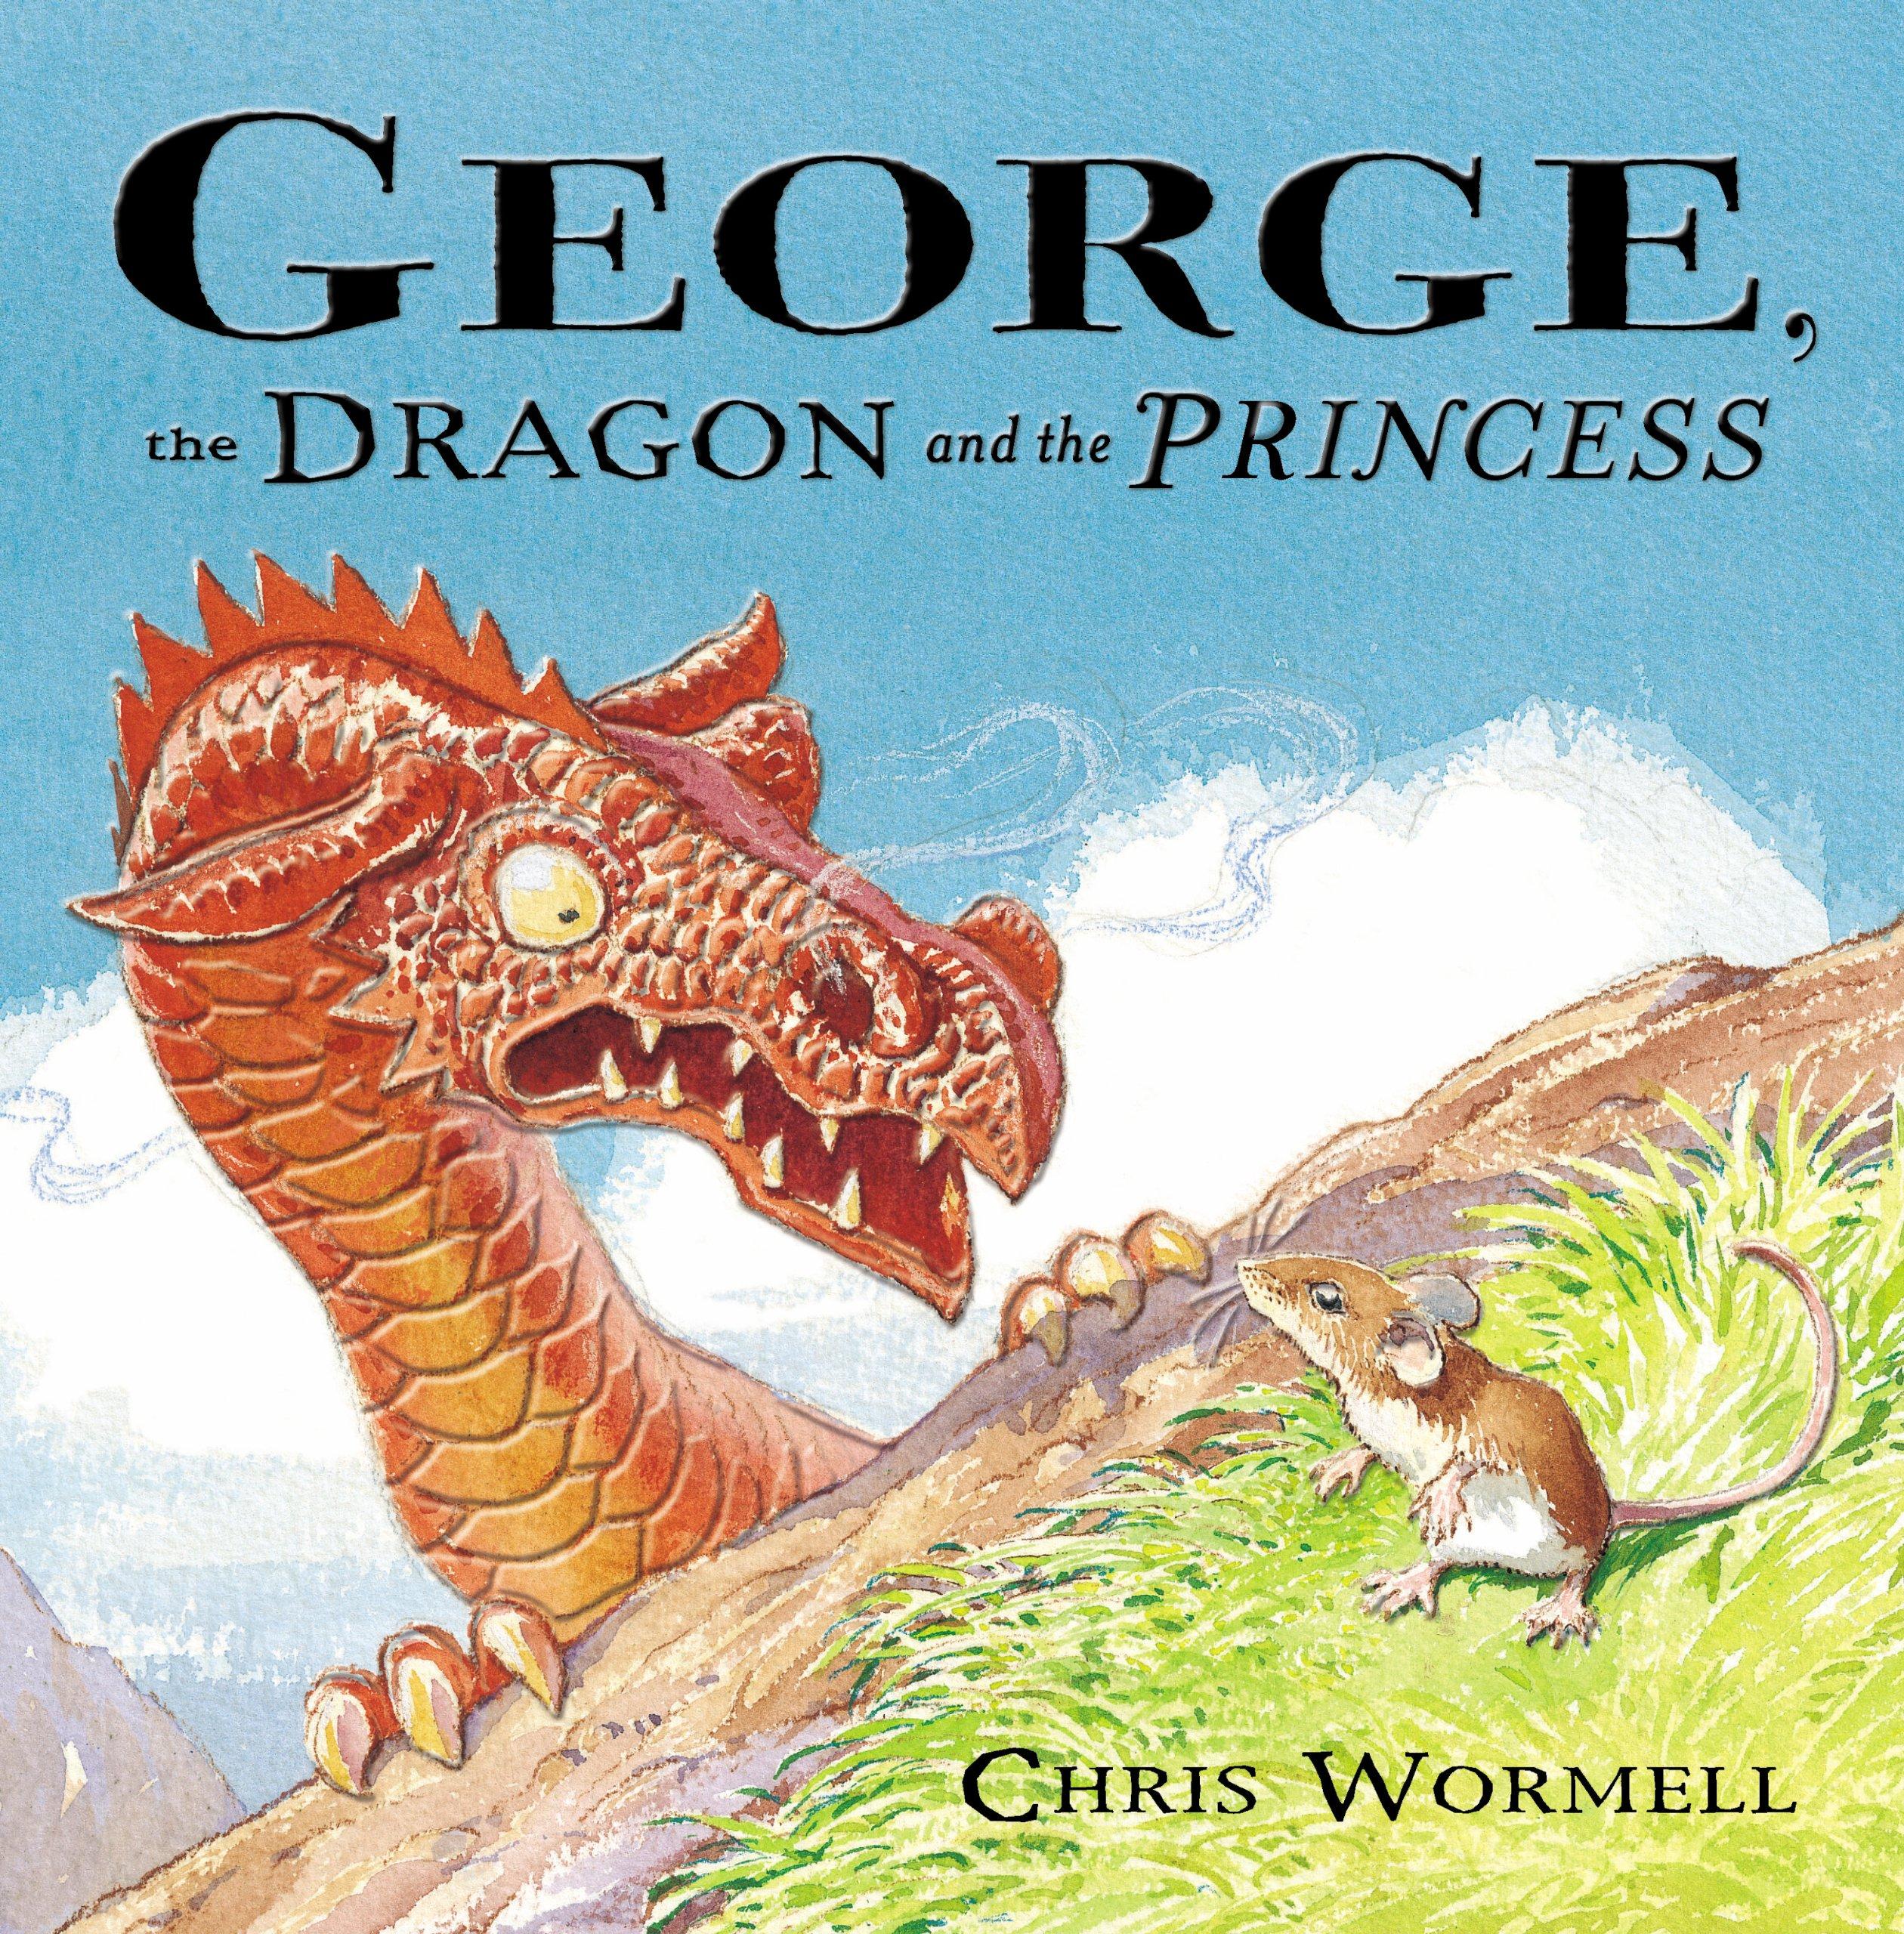 George, the Dragon and the Princess: Chris Wormell: 9781862301863:  Amazon.com: Books